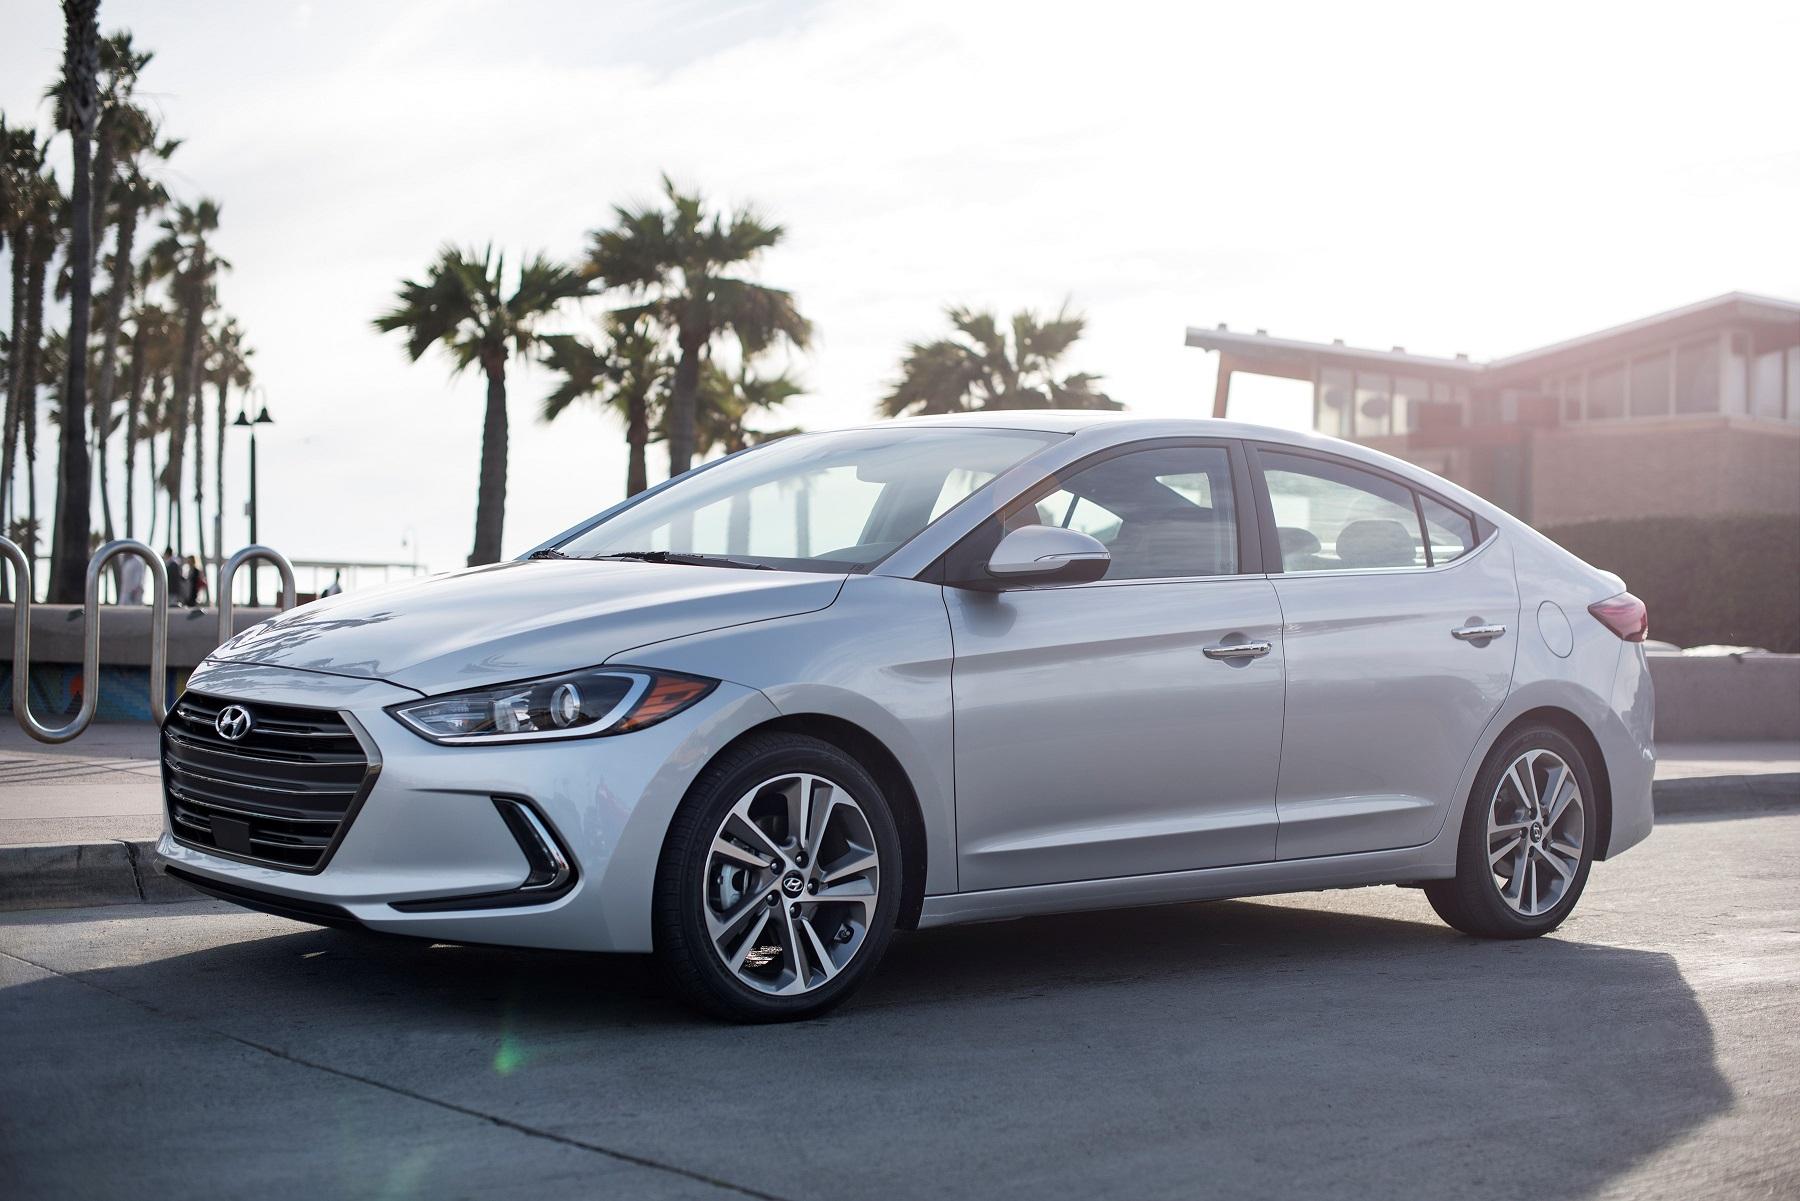 Hyundai Elantra: Introduction